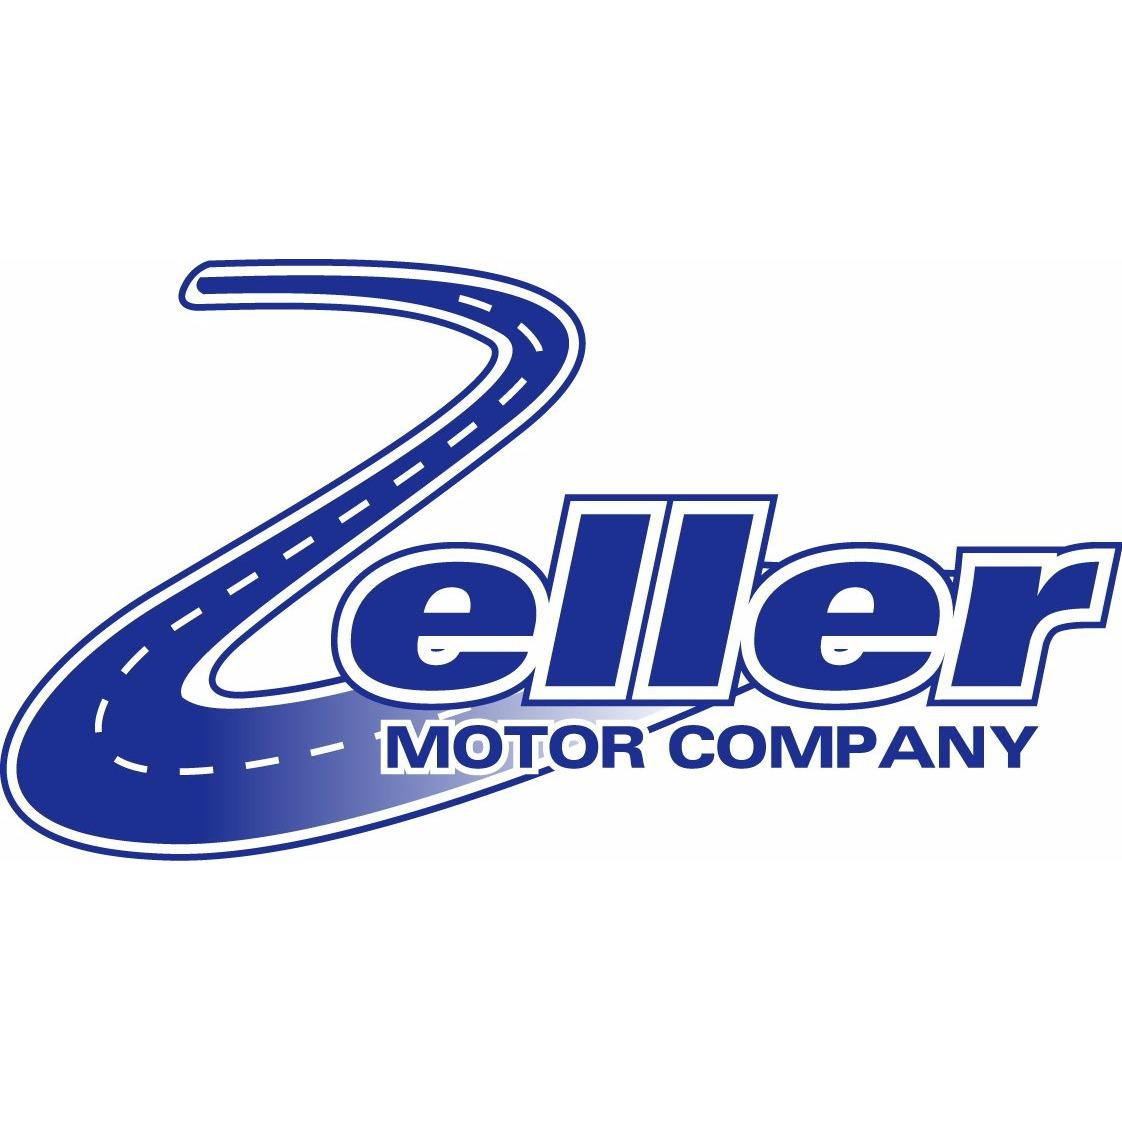 Zeller Motor Company